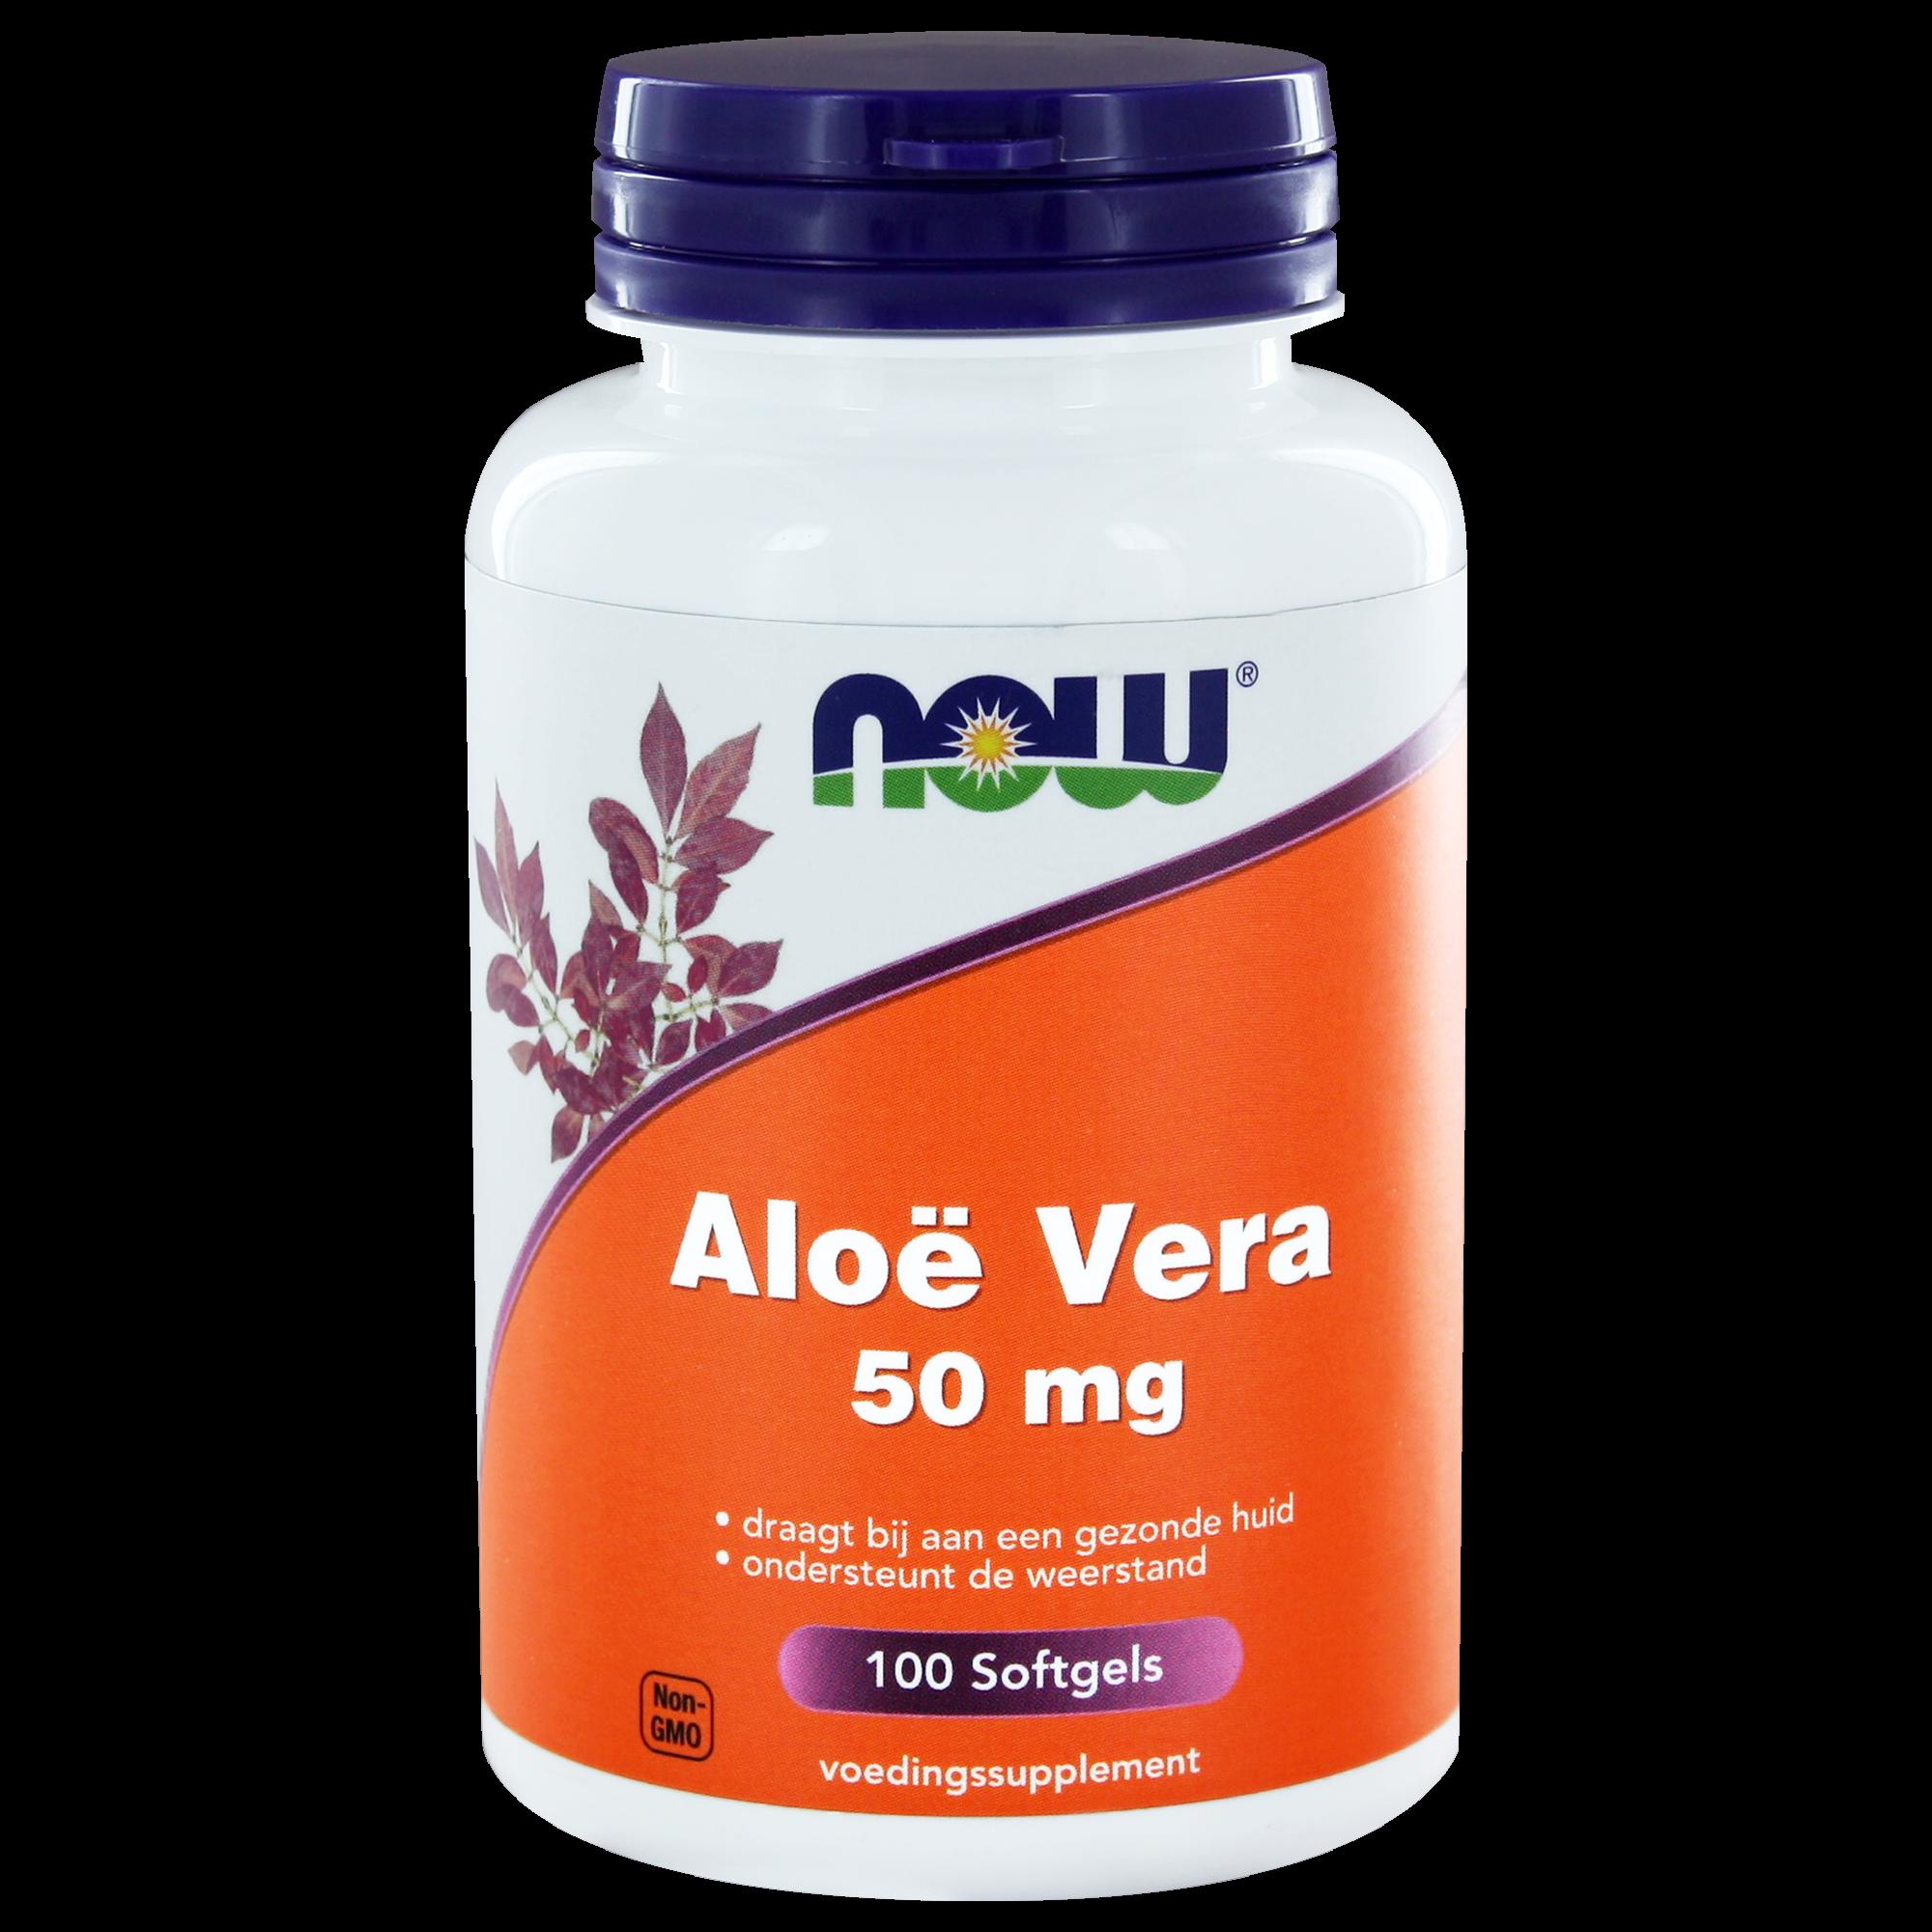 Aloe Vera Softgels